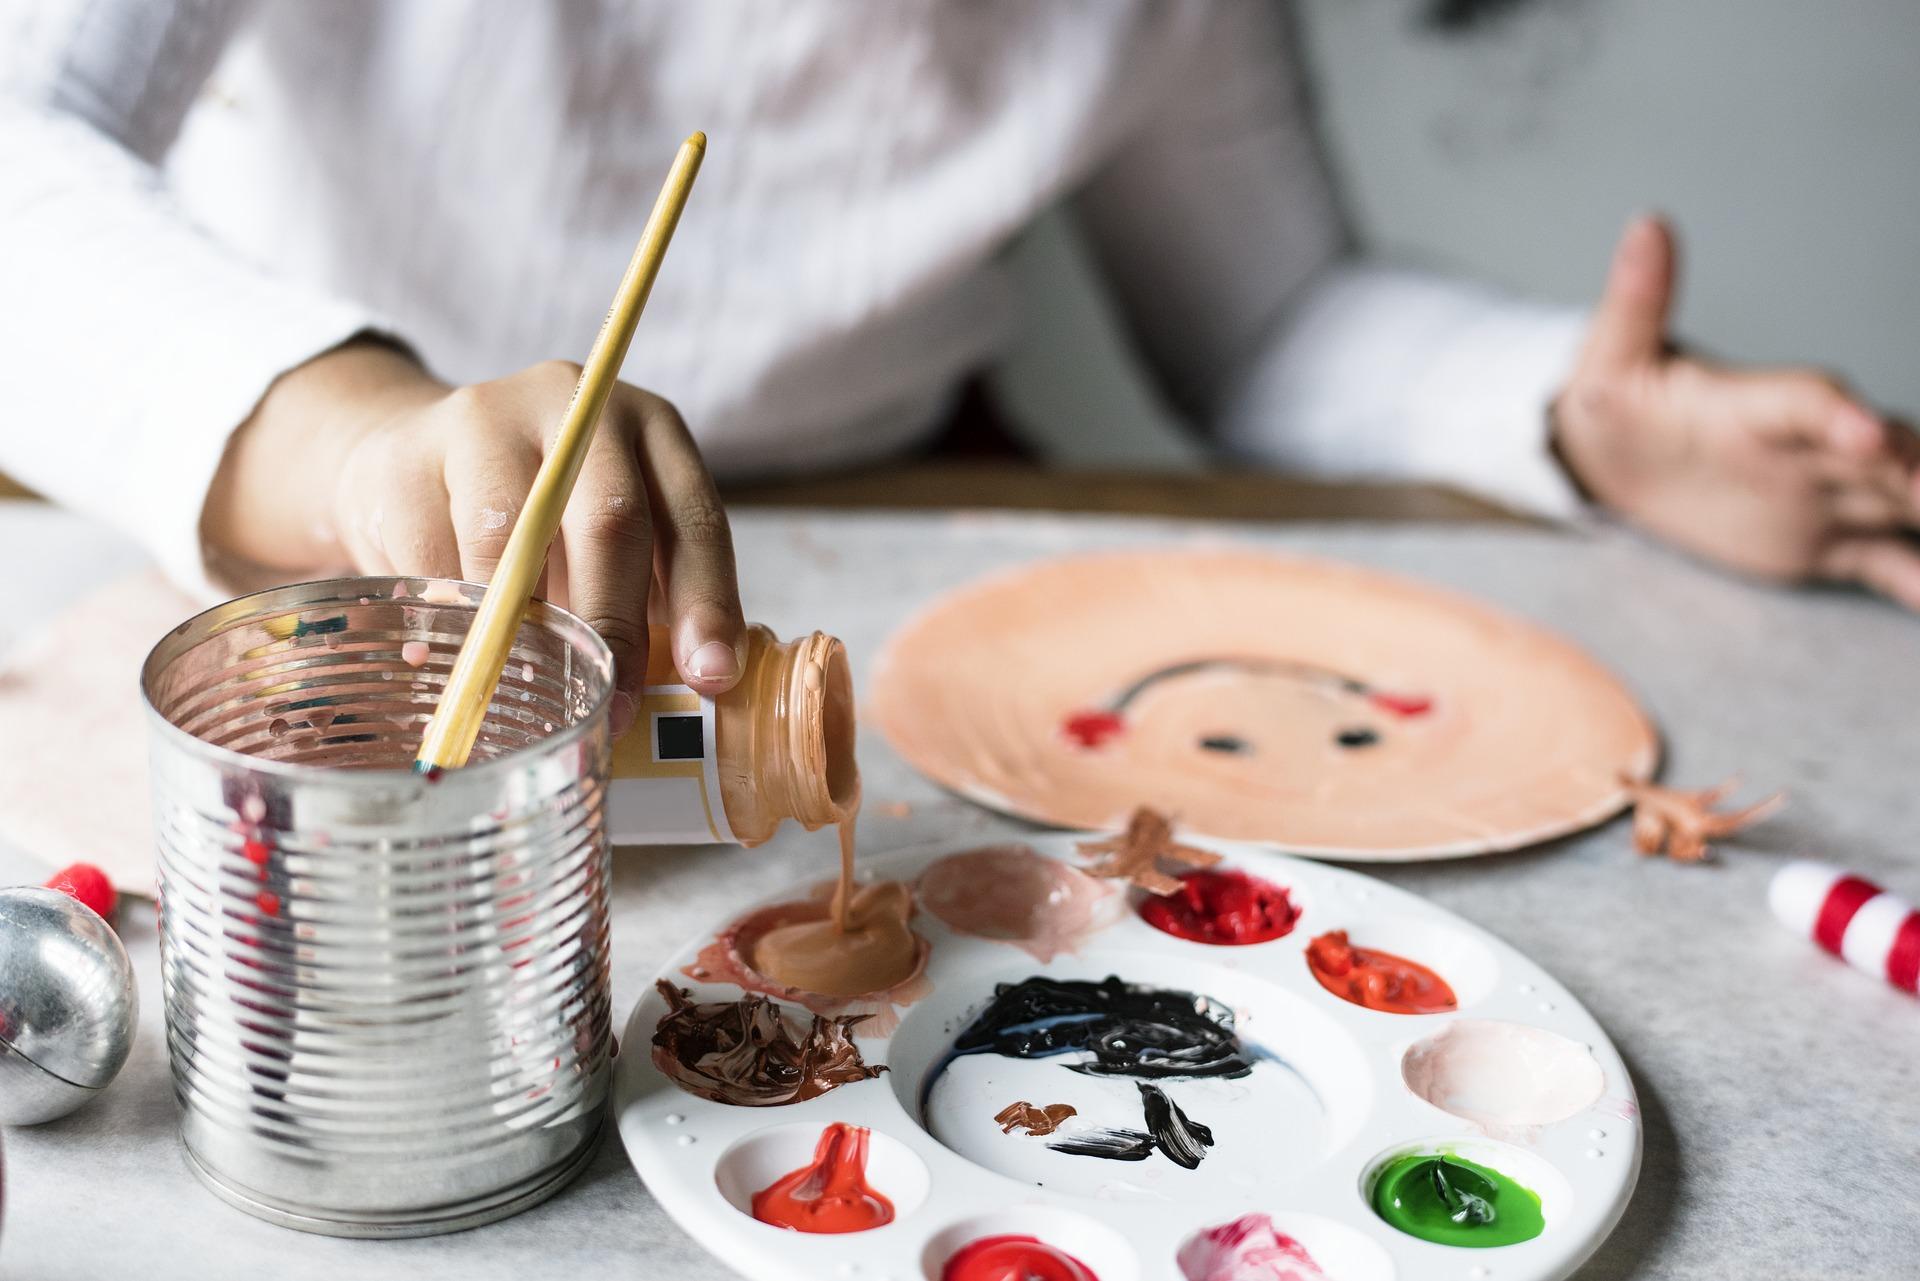 Kreatif Menciptakan Peralatan Atau Perabotan Do-It-Yourself (DIY)